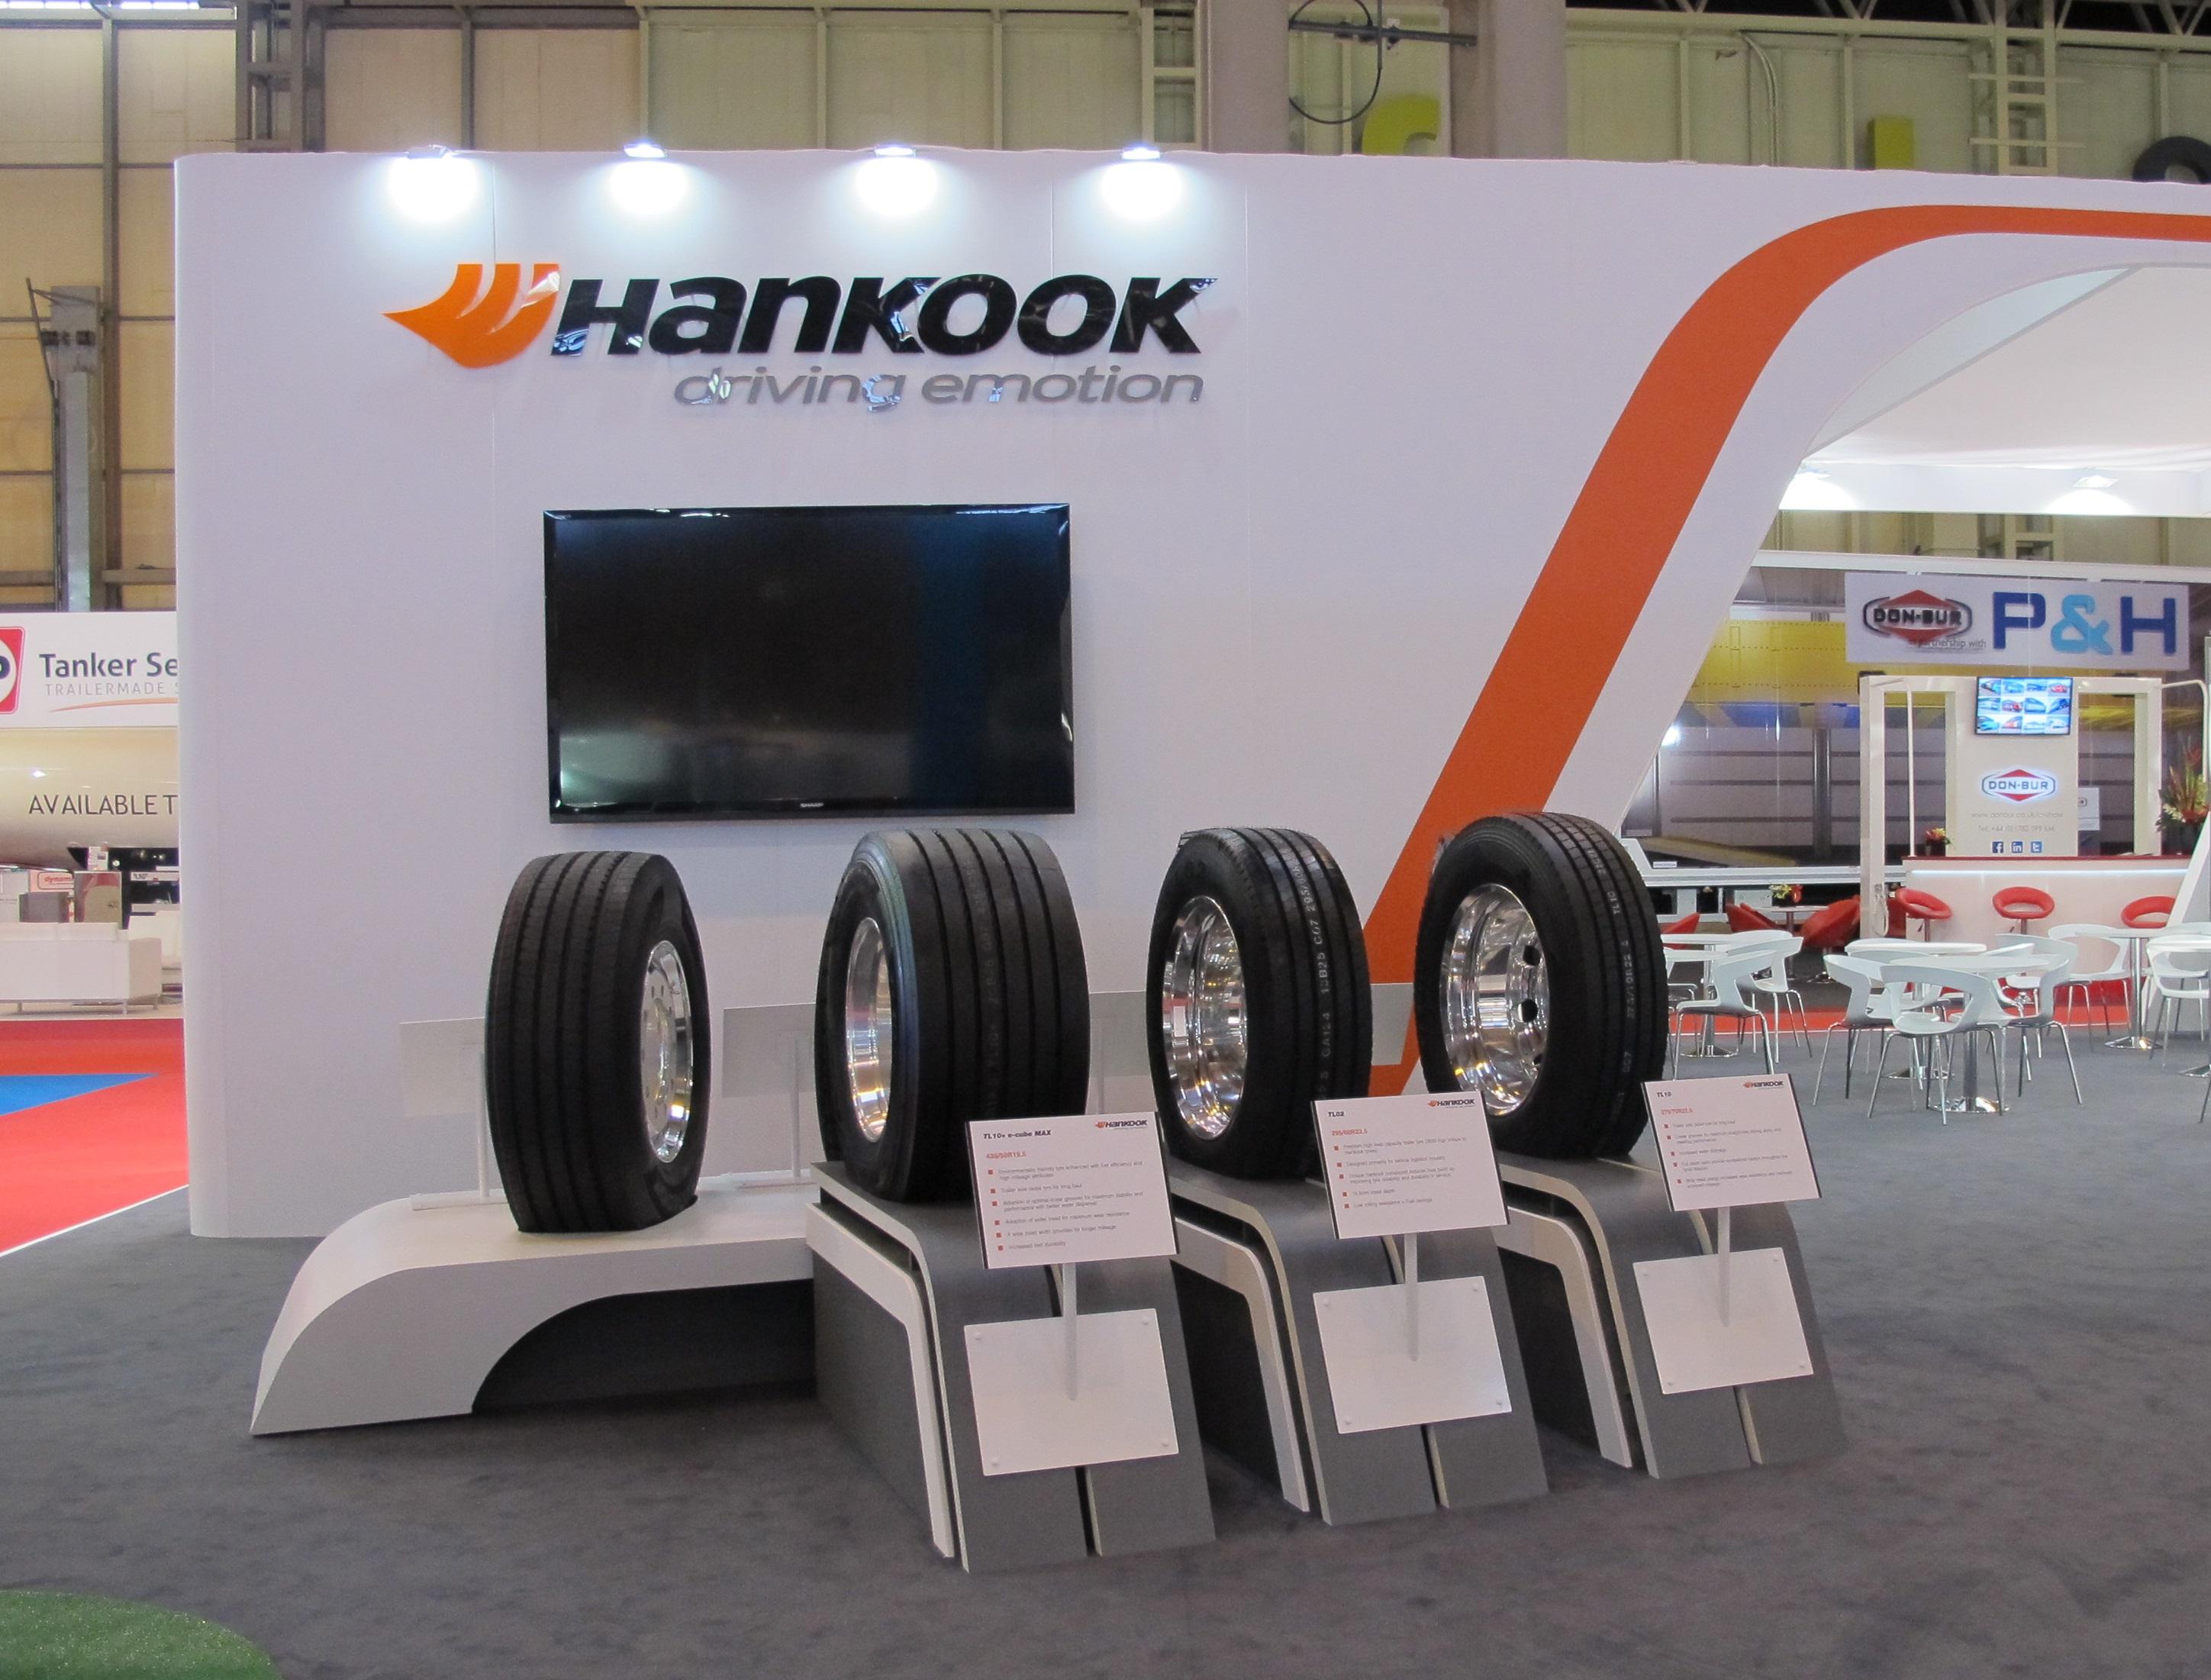 Hankook Tire Media Center Press Room Europe CIS Hankook - Car show wheel stands